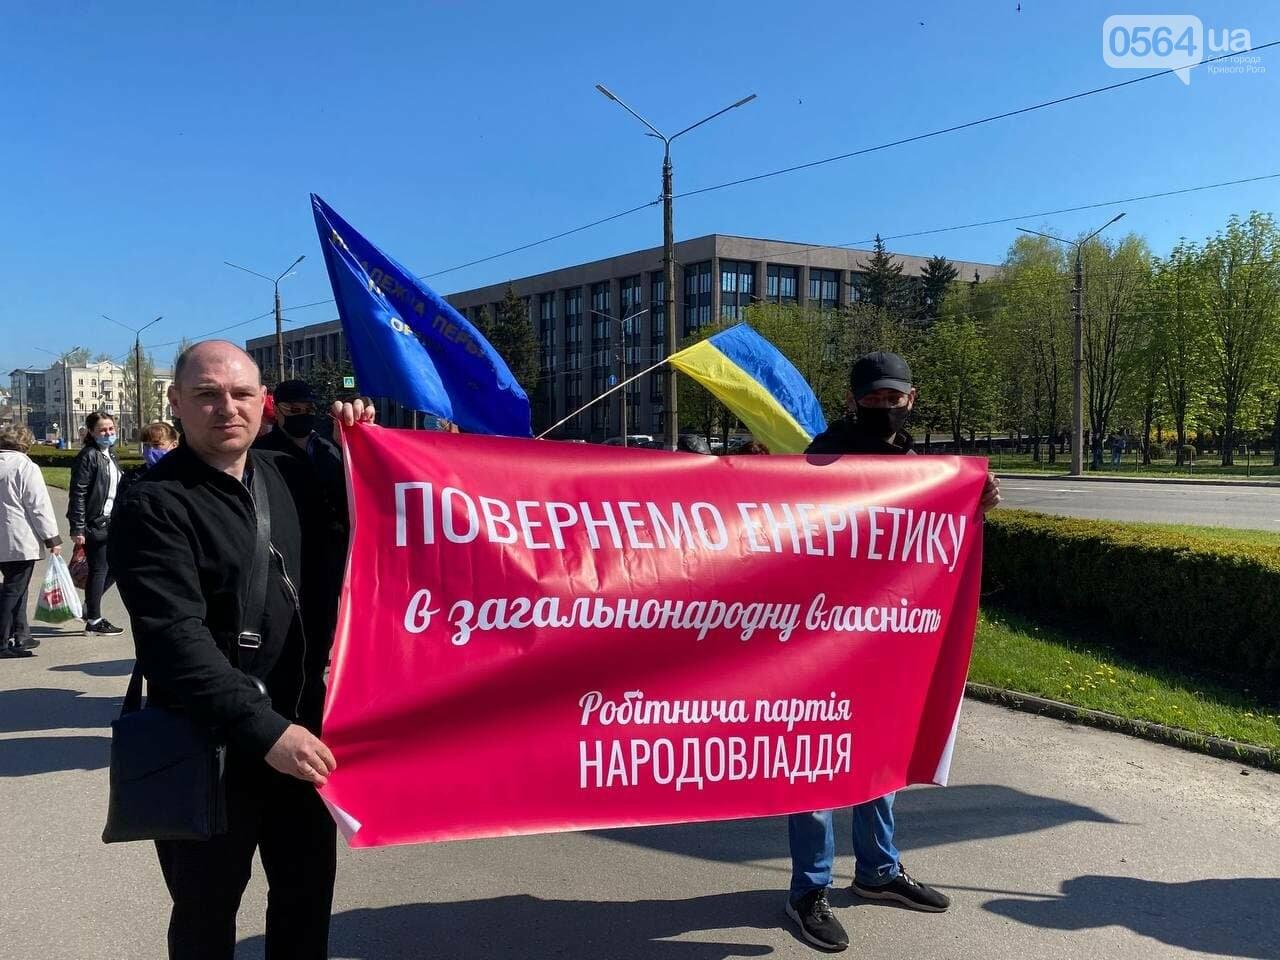 """Мир! Труд! Май!"", ""Зарплату 1000 евро!"", - криворожане вышли на первомайский марш, - ФОТО, ВИДЕО , фото-1"